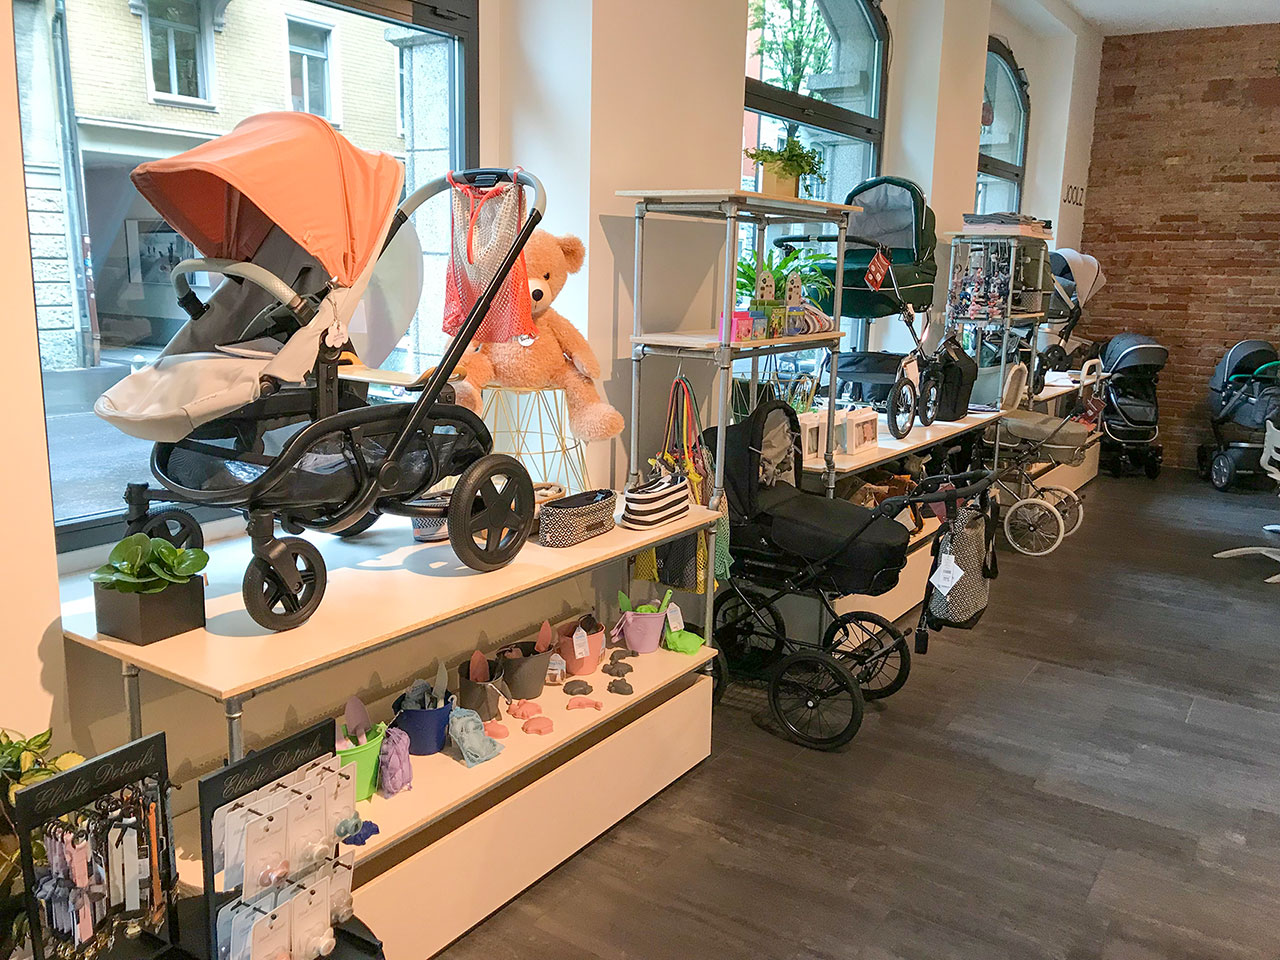 Ladenbau - Laden Neubau Baby Rose Luzern